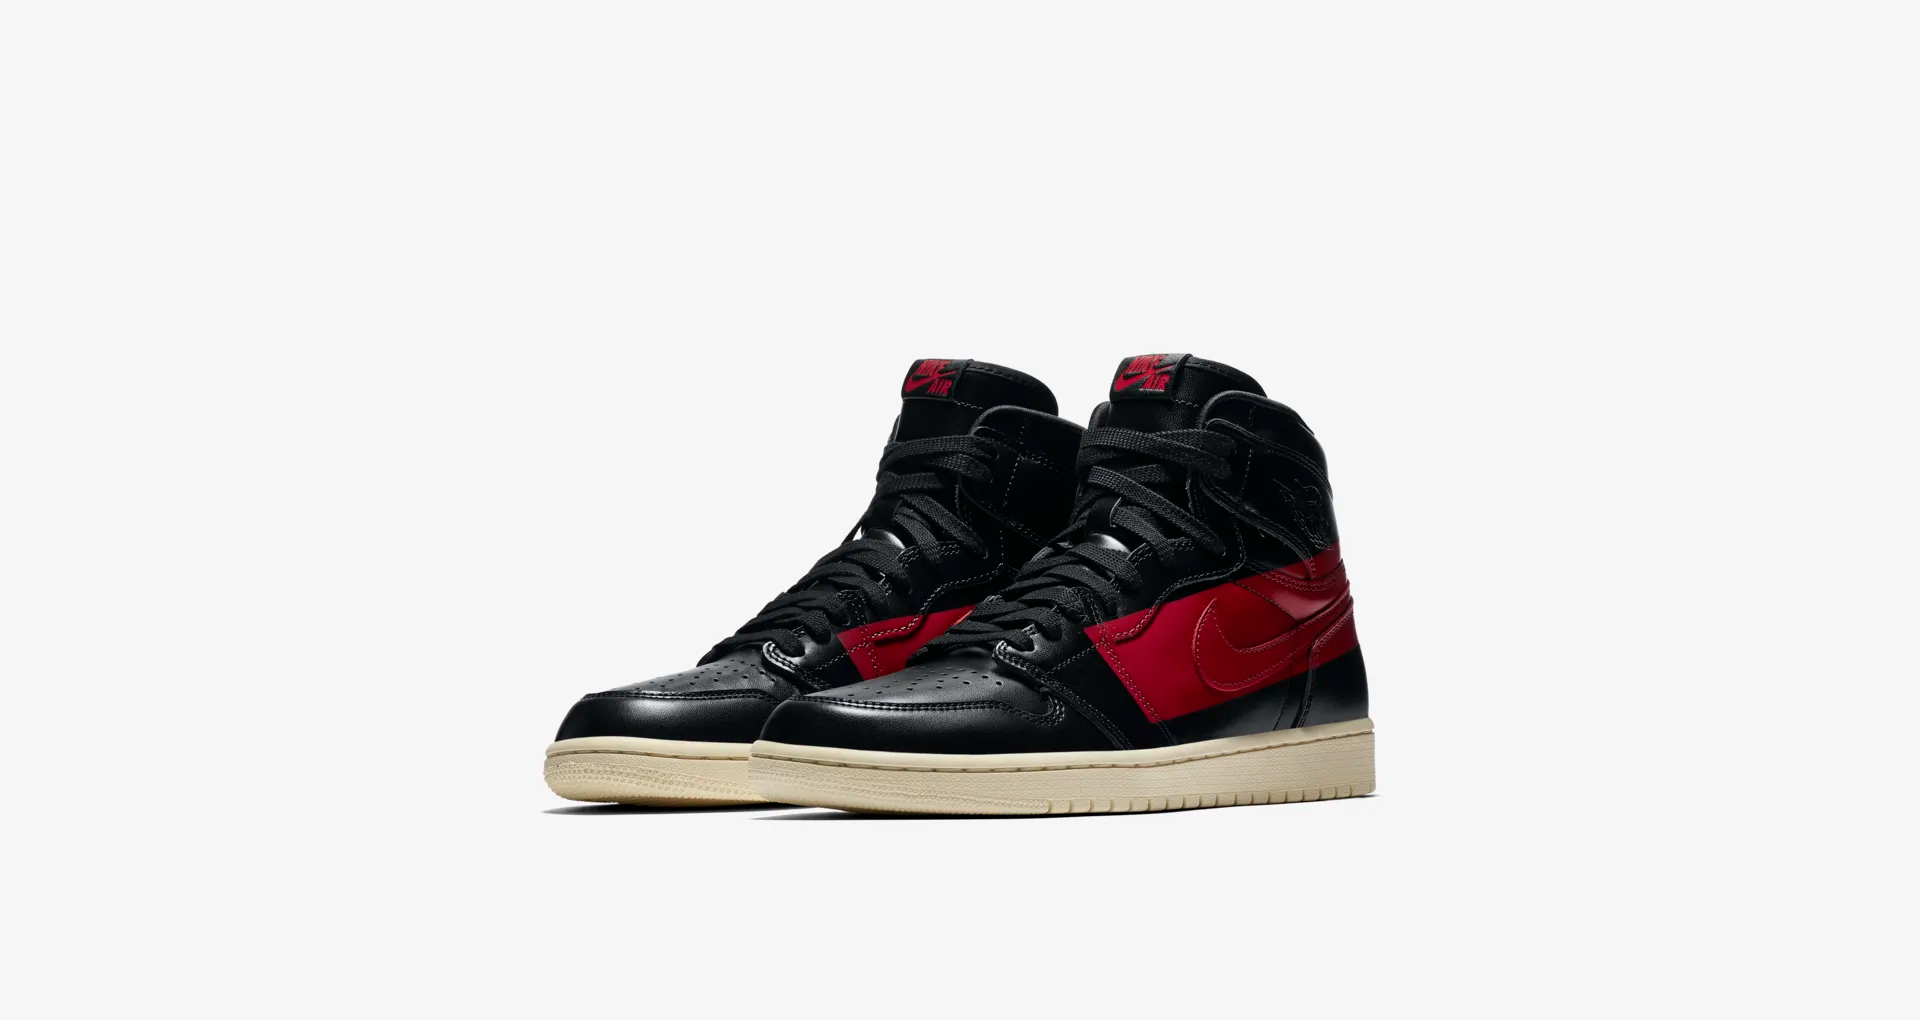 BQ6682 006 Air Jordan 1 High OG Couture 1